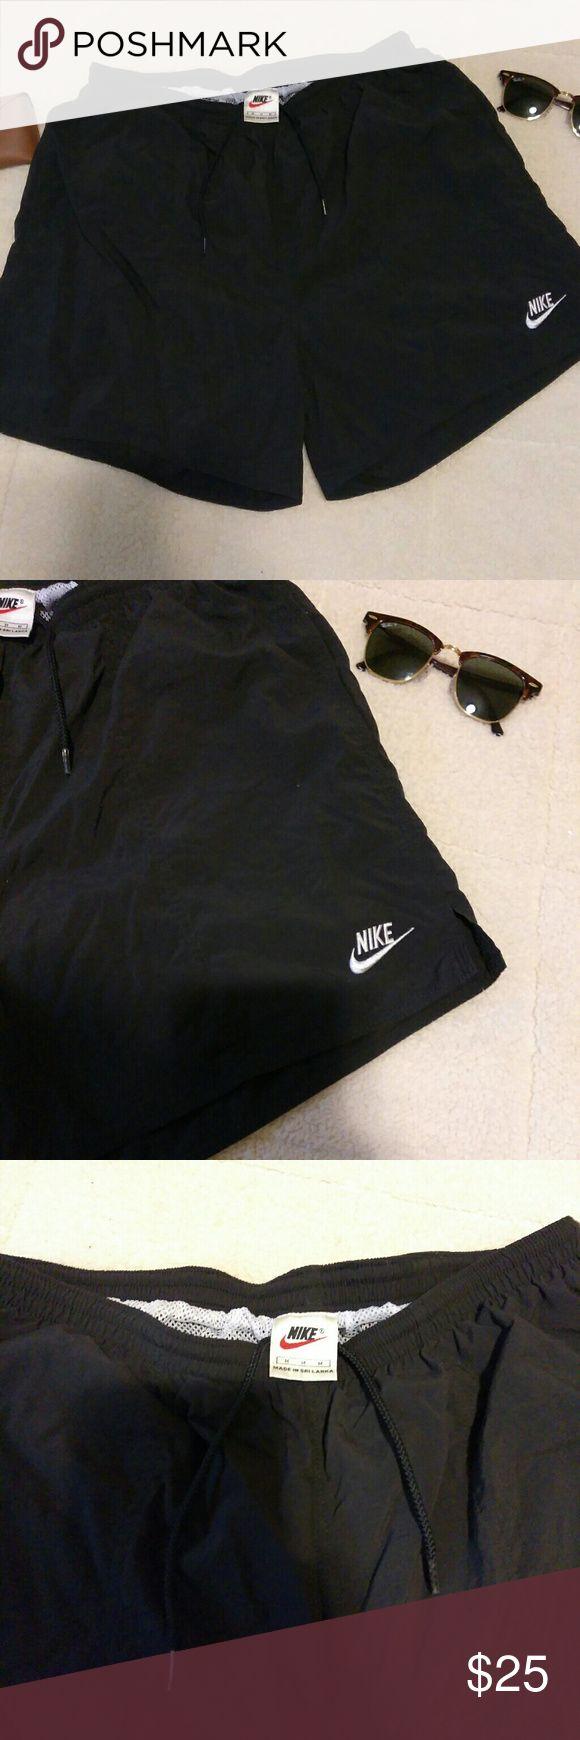 Vintage Black Nike Swim Trunks Vintage Nike black swim shorts with embroidered logo and white mesh lining Nike Swim Swim Trunks